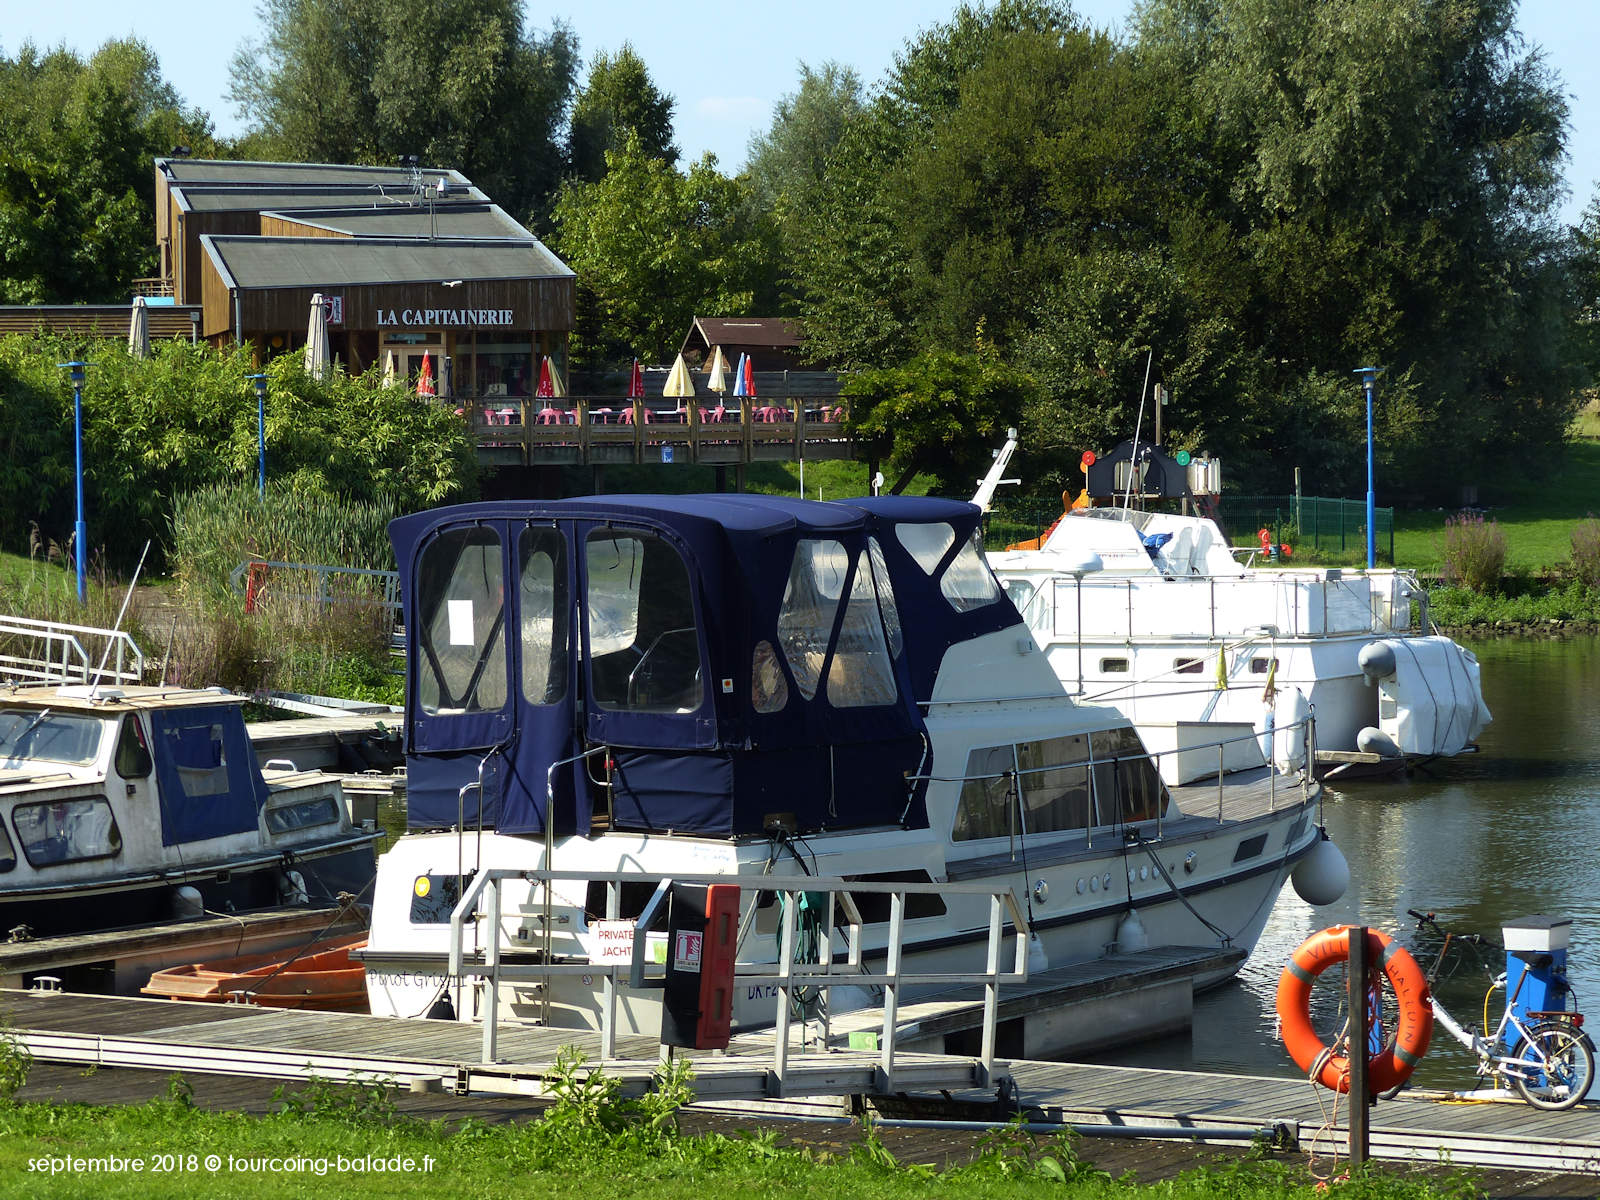 Port de Plaisance d'Halluin-Menin